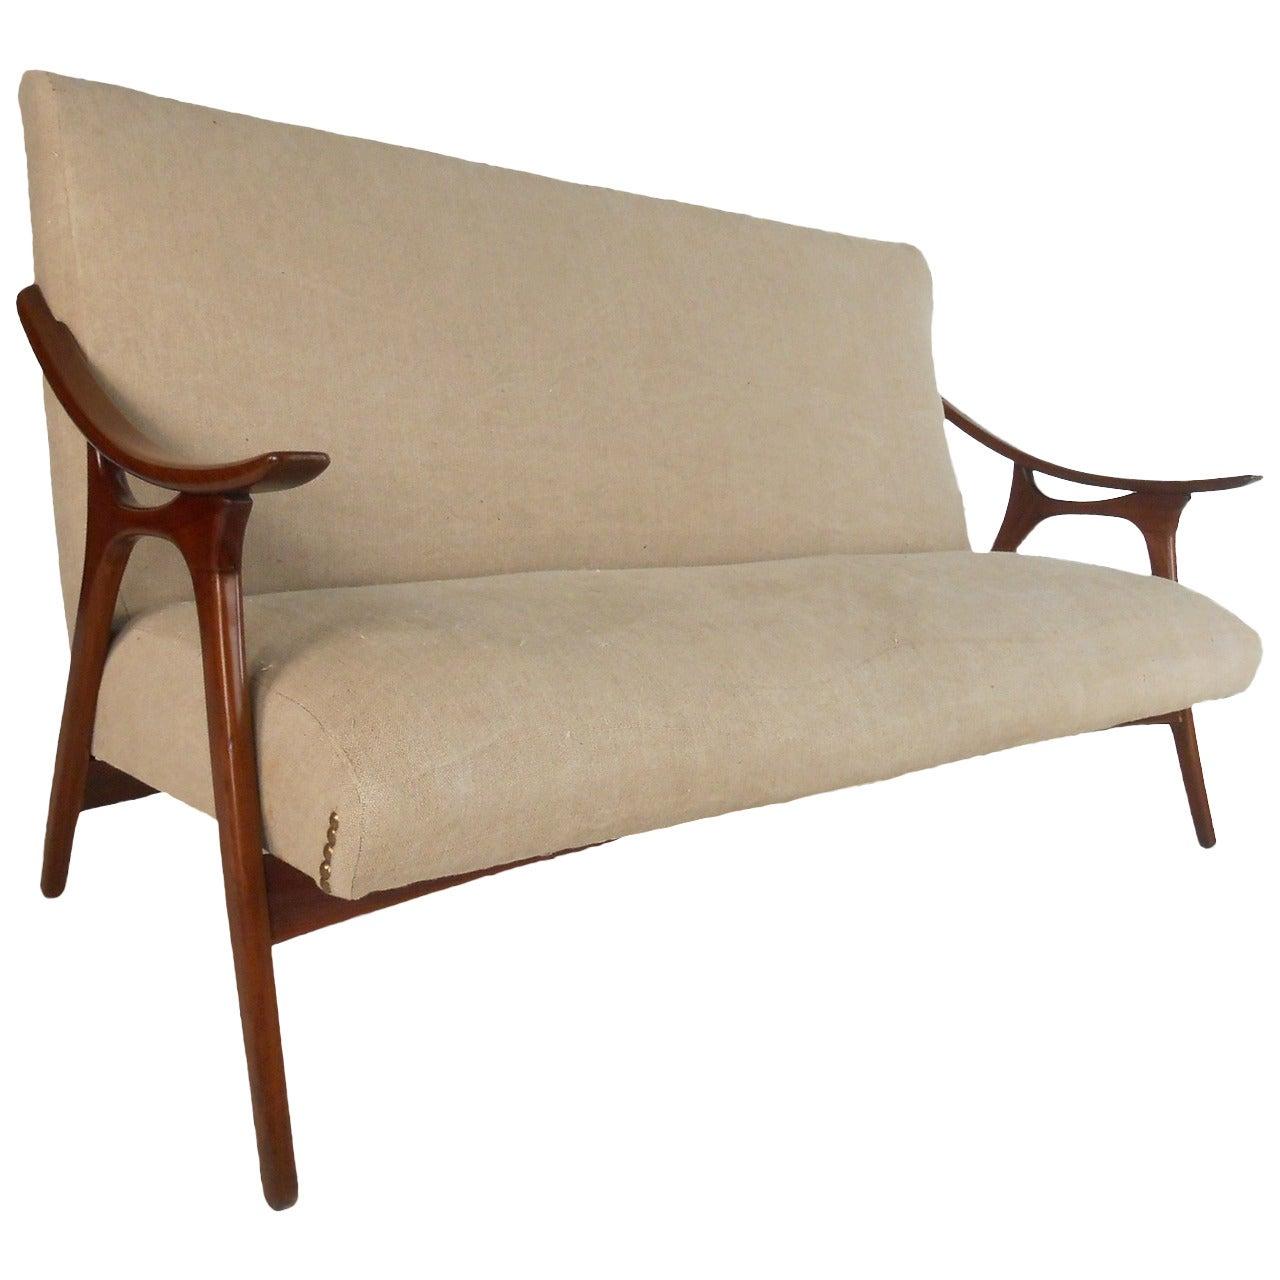 Mid-Century Modern Peter Hvidt Style Sofa